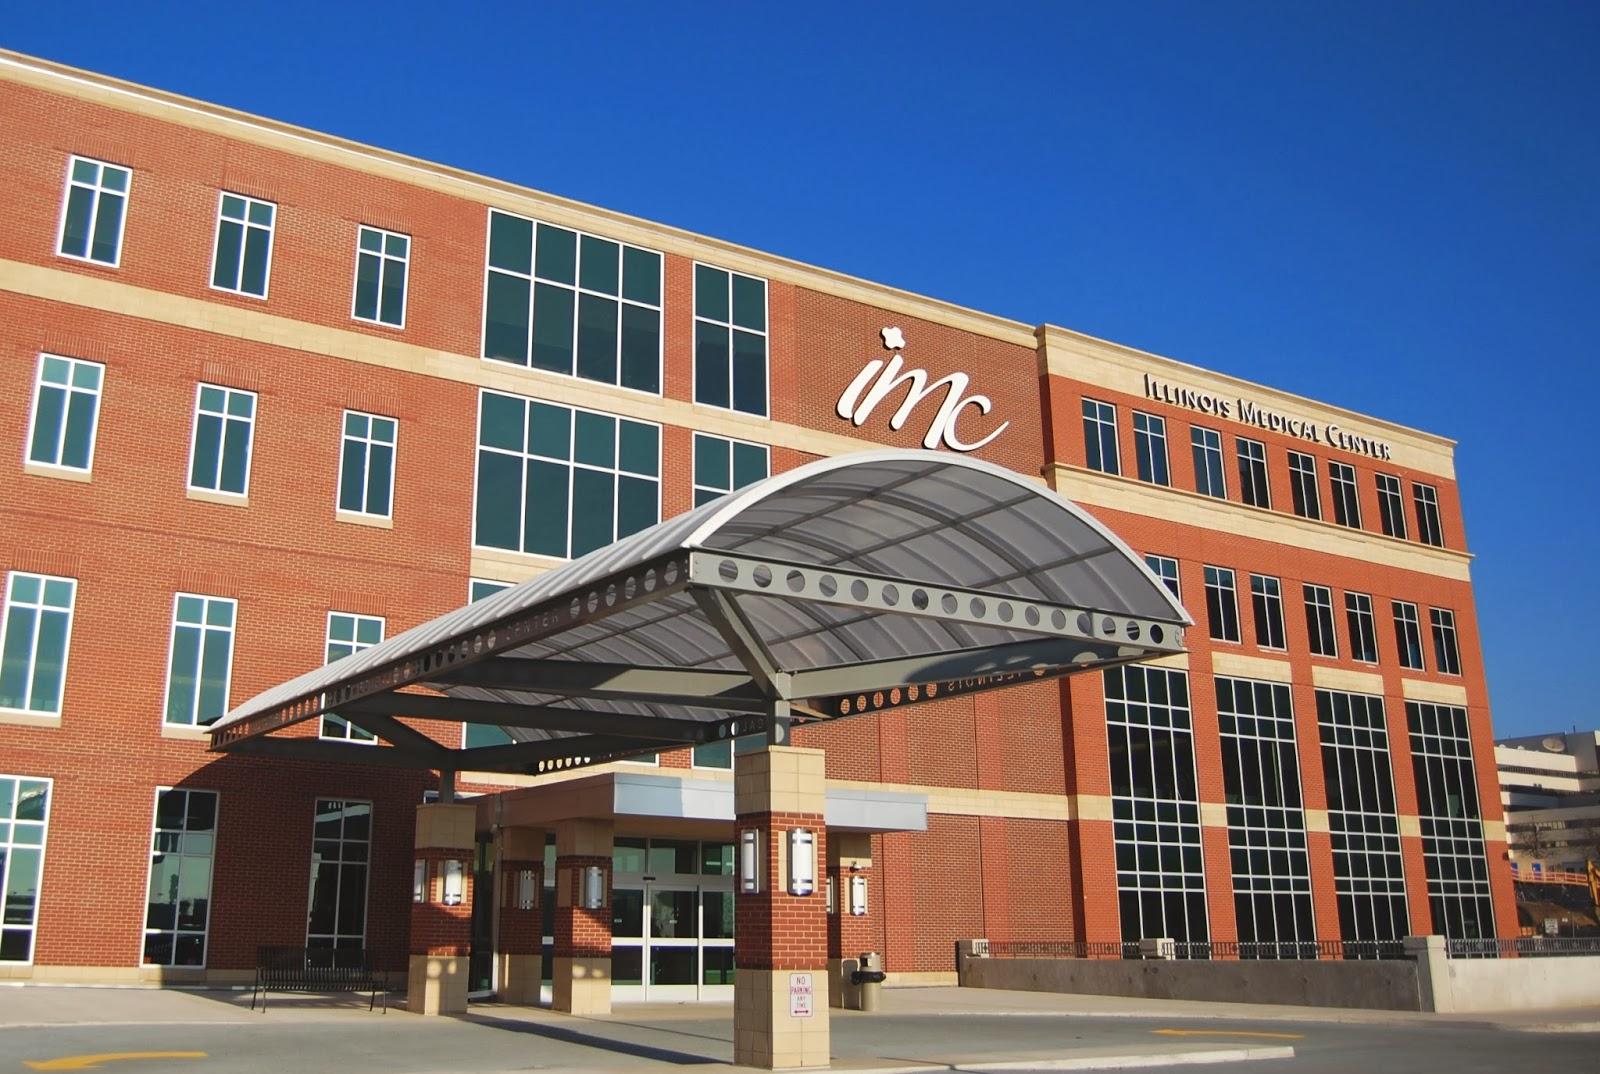 lllinois Medical Center building